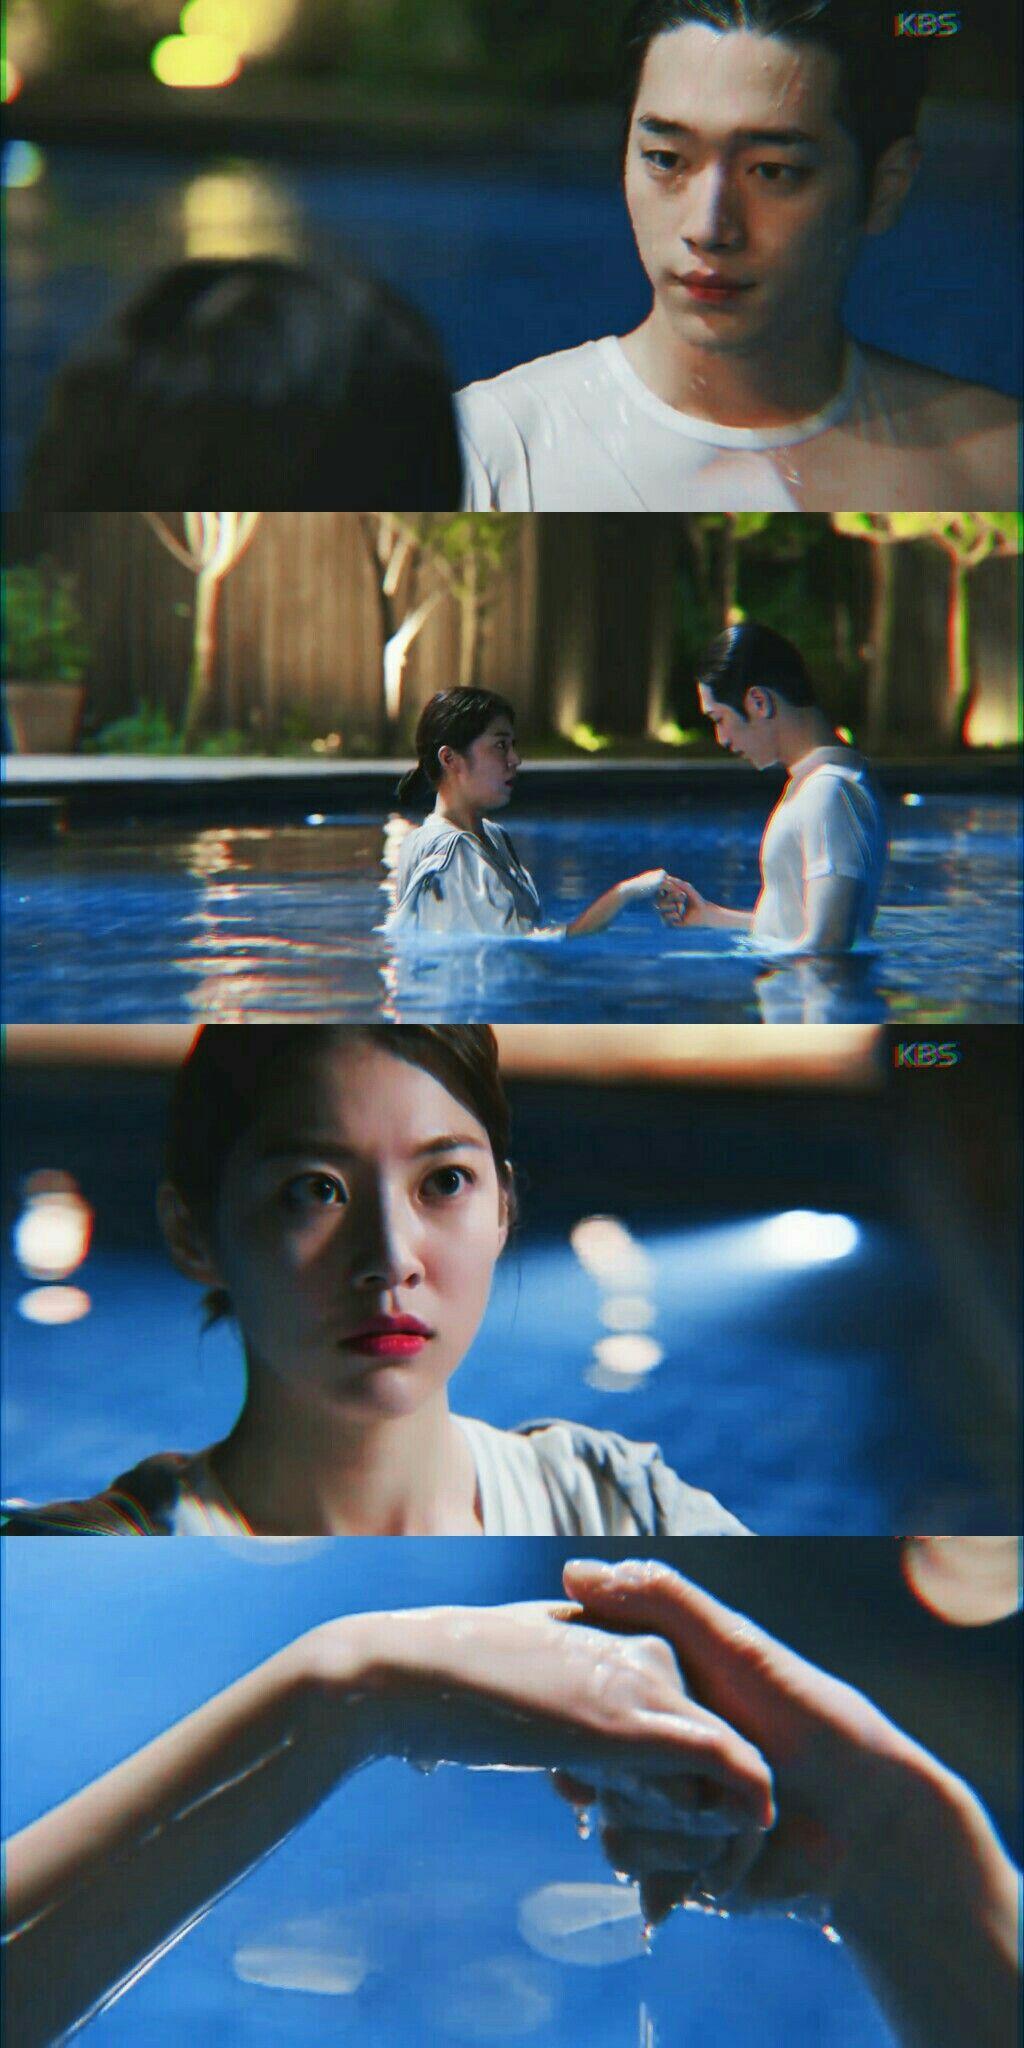 Are You Human Too Seo Kang Joon Nam Shin Kong Seung Yeon So Bong